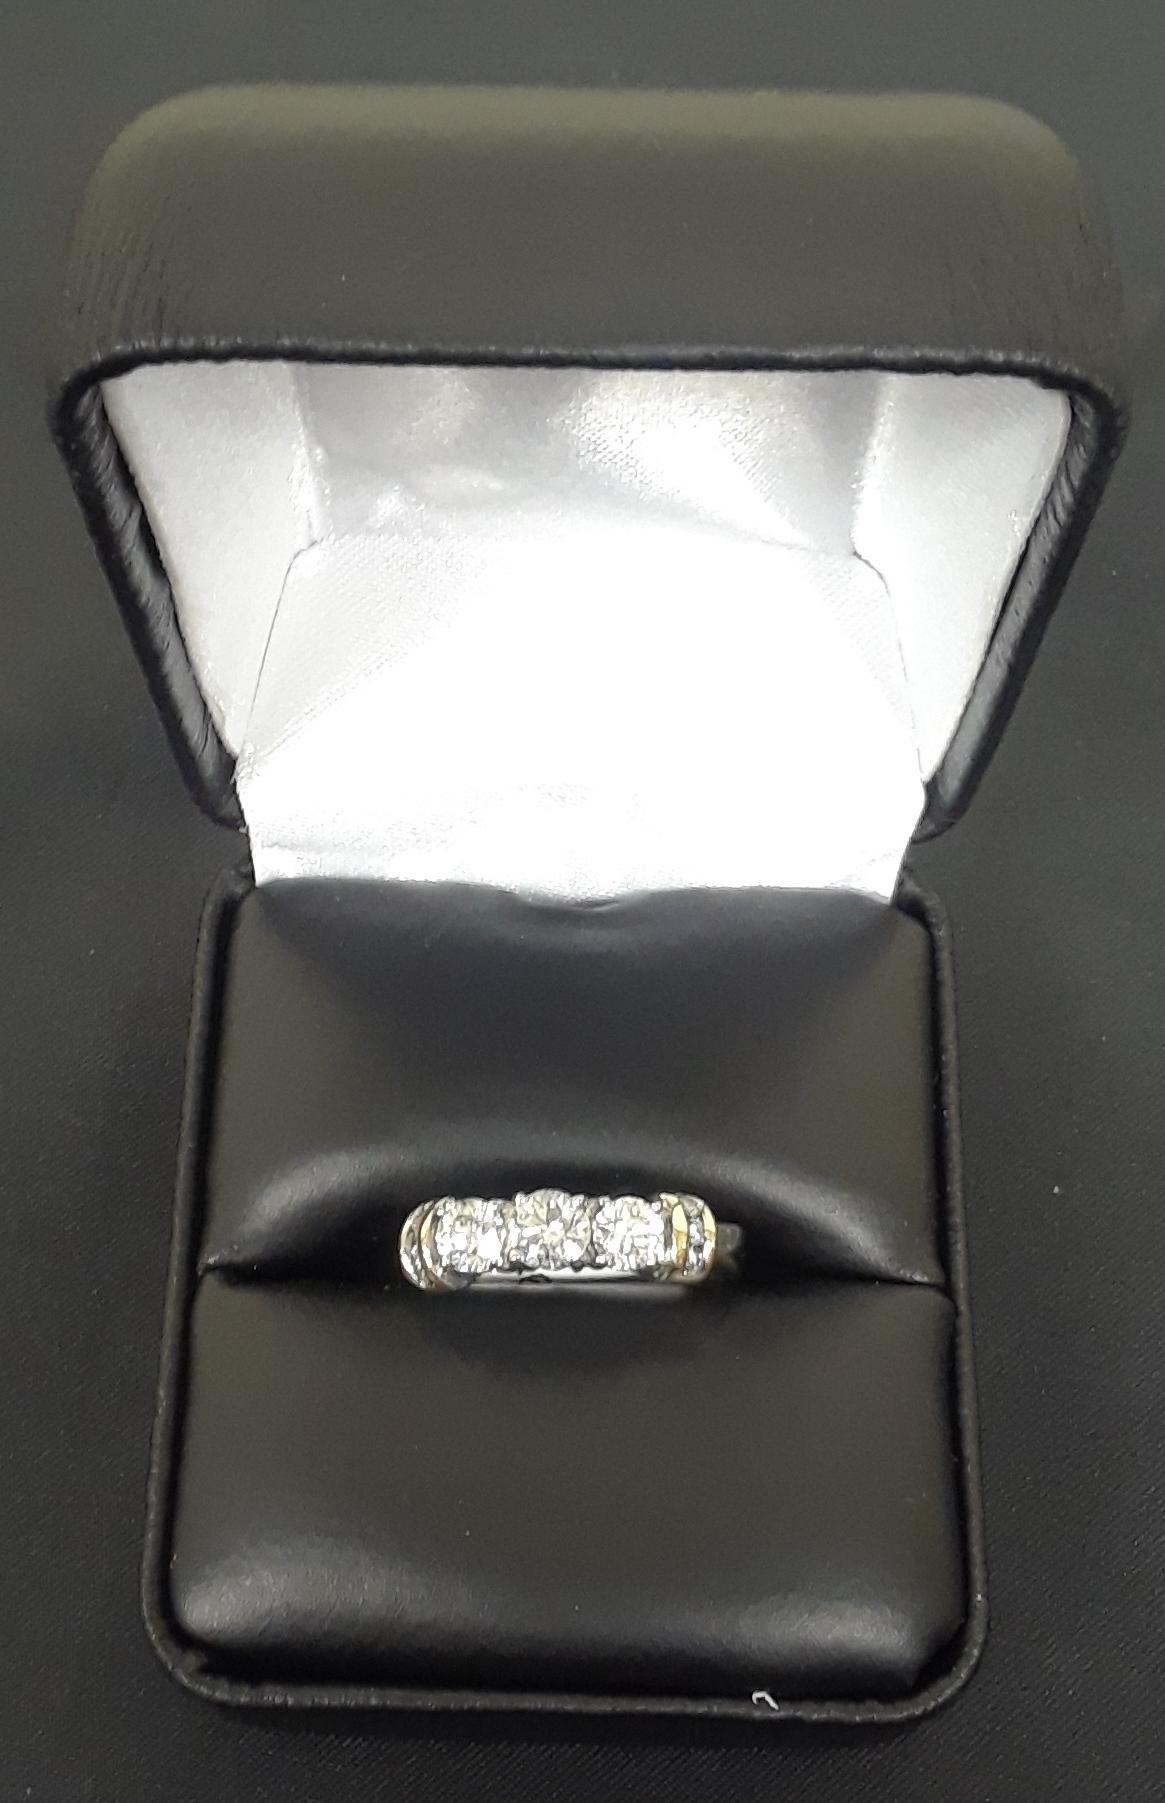 SIZE 7 10KT WHITE GOLD DIAMOND RING